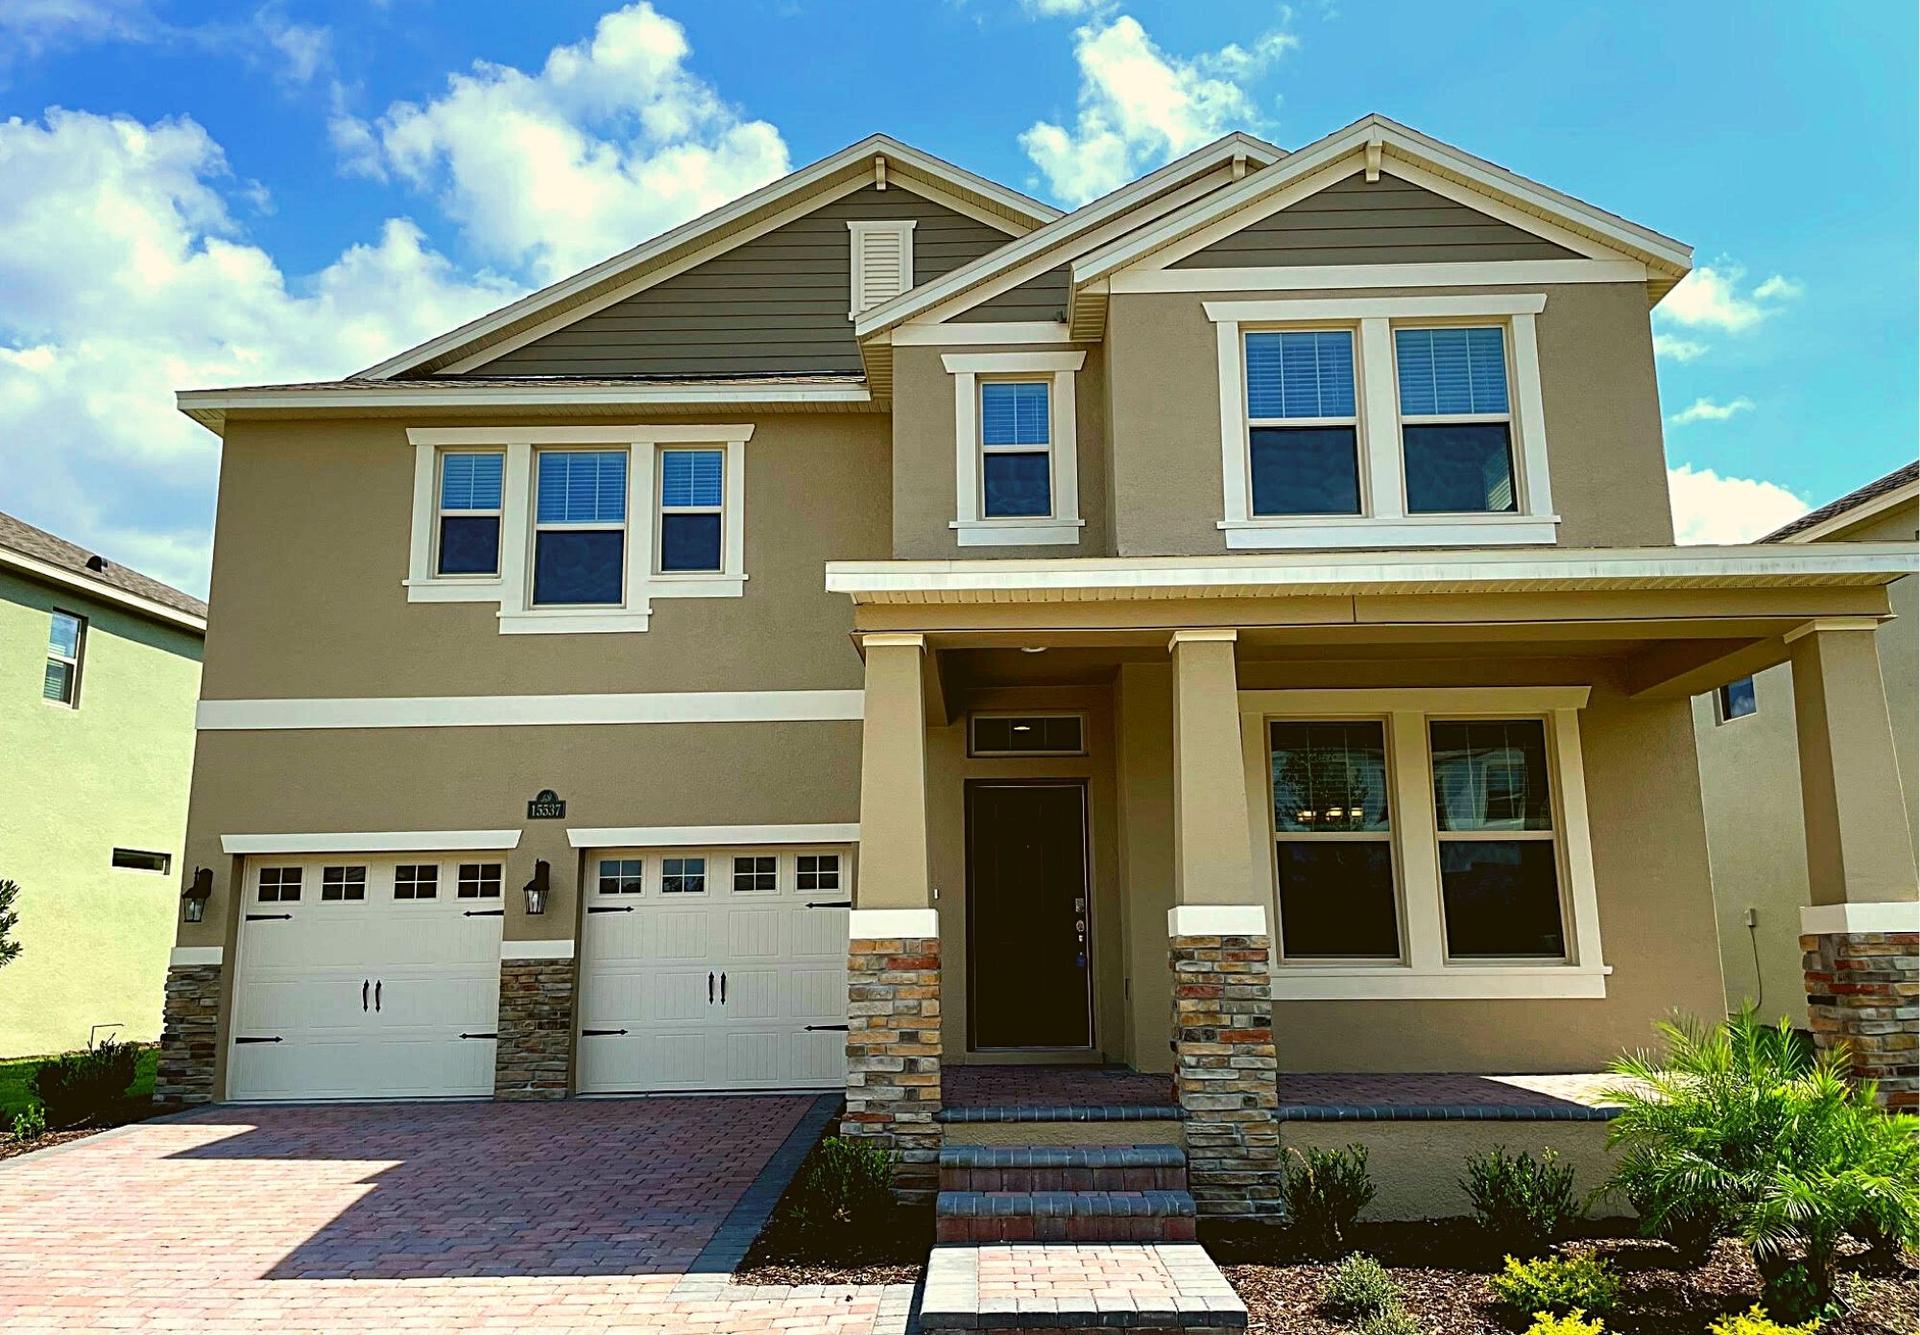 Photo of property: 15537 Mango Isle St Winter Garden, FL 34787